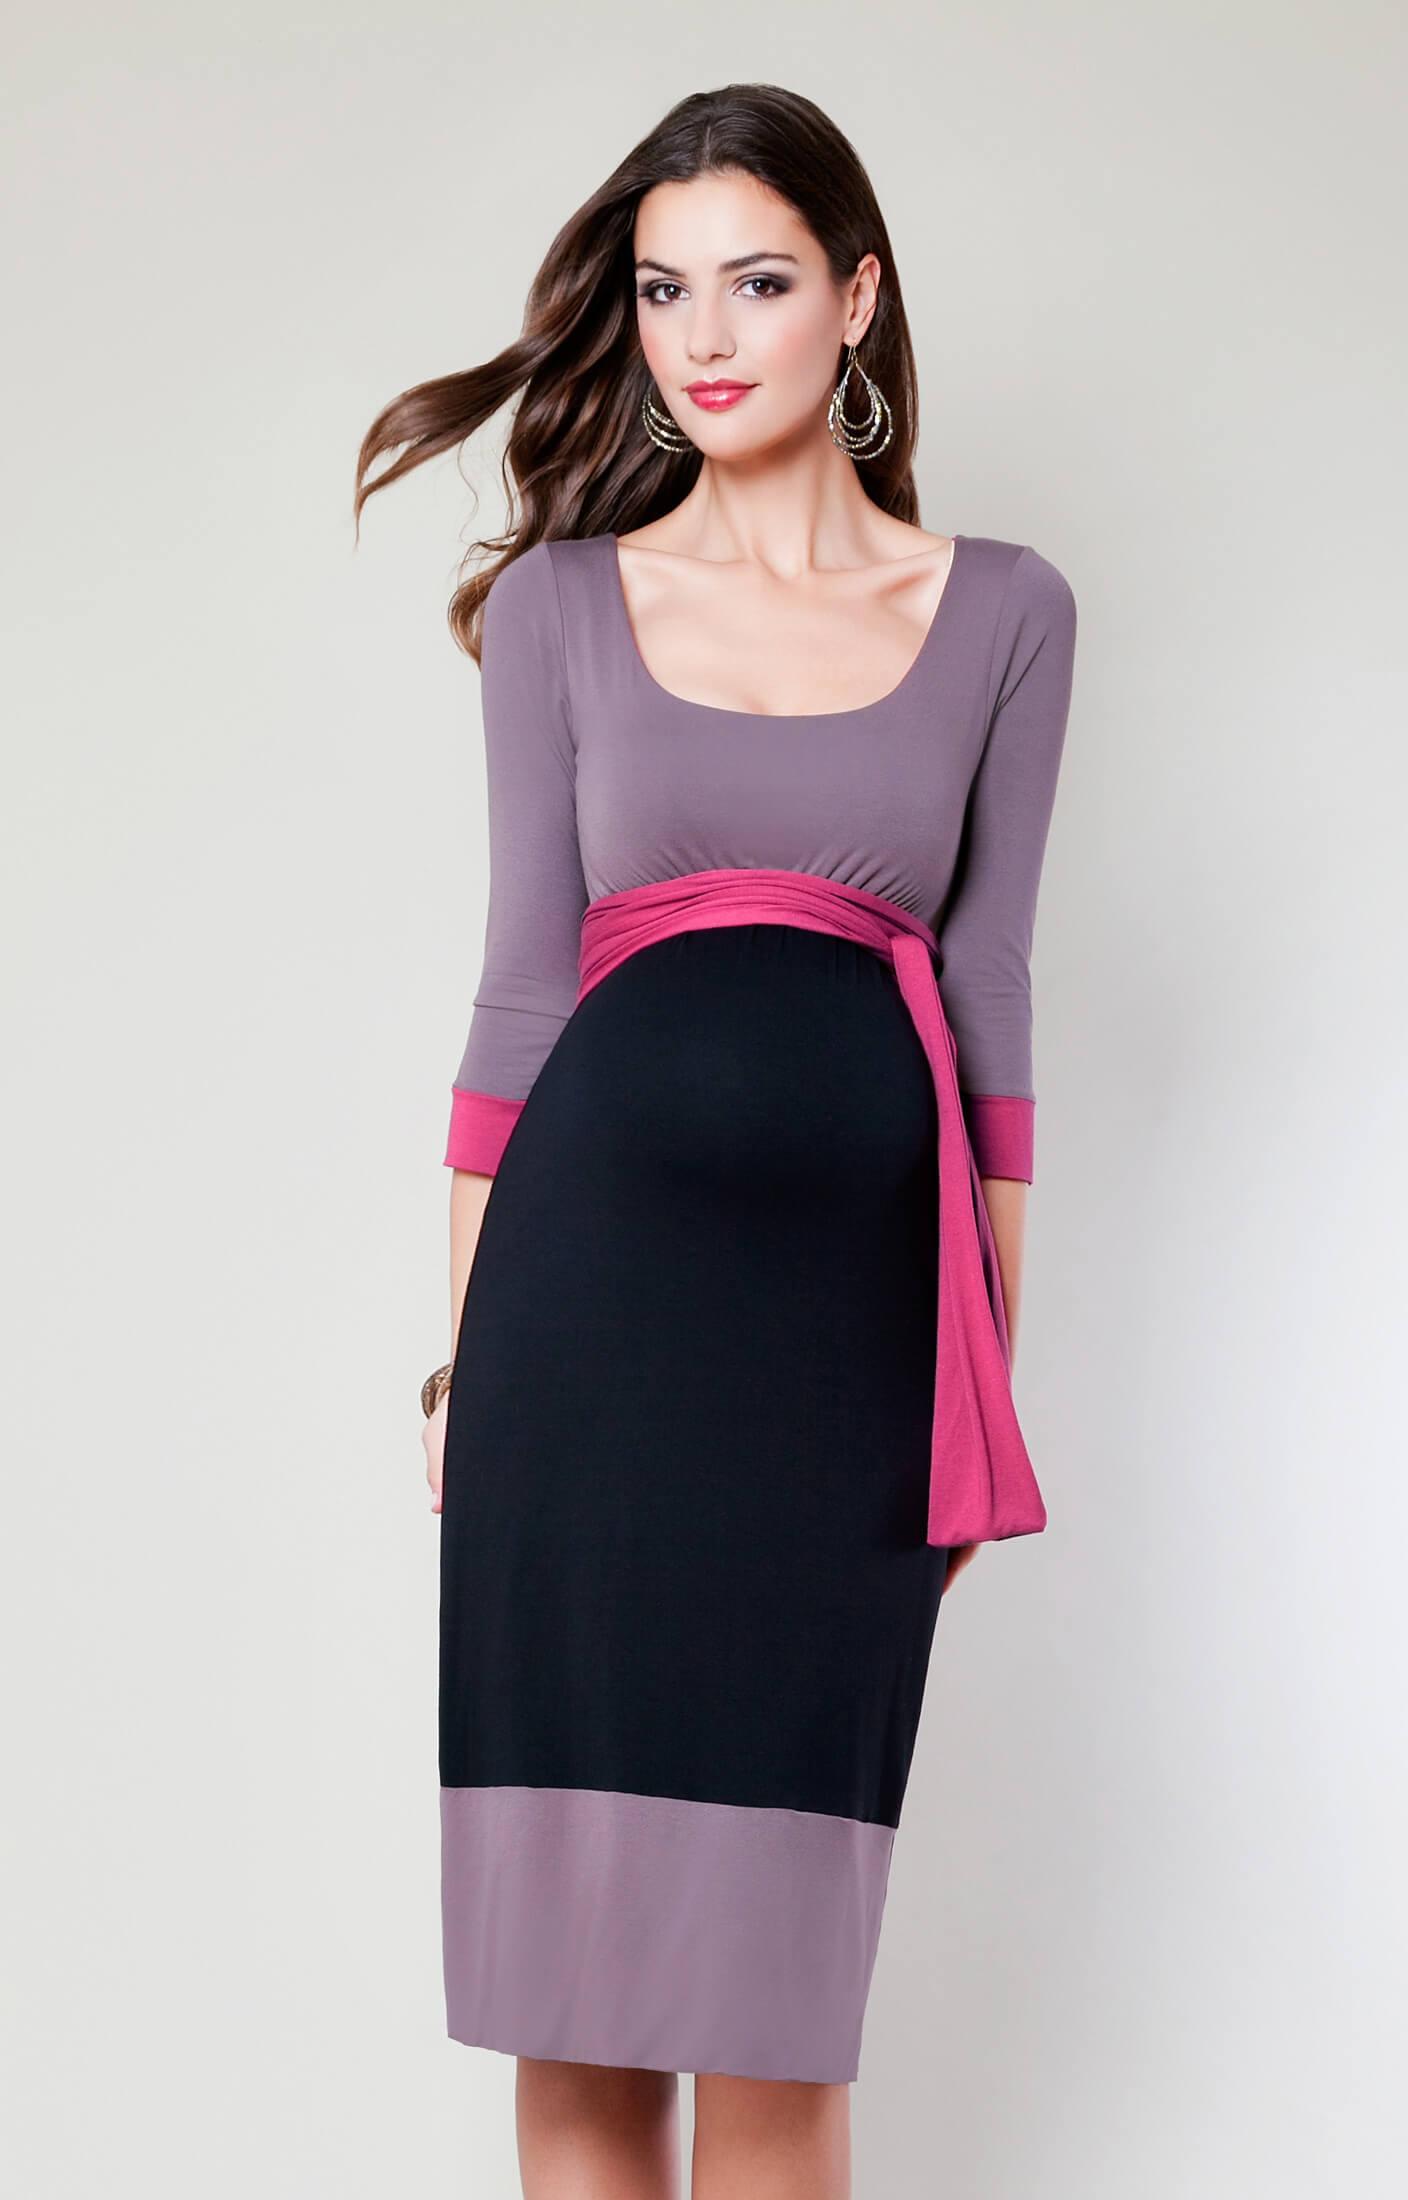 Colour Block Maternity Dress Truffle Maternity Wedding